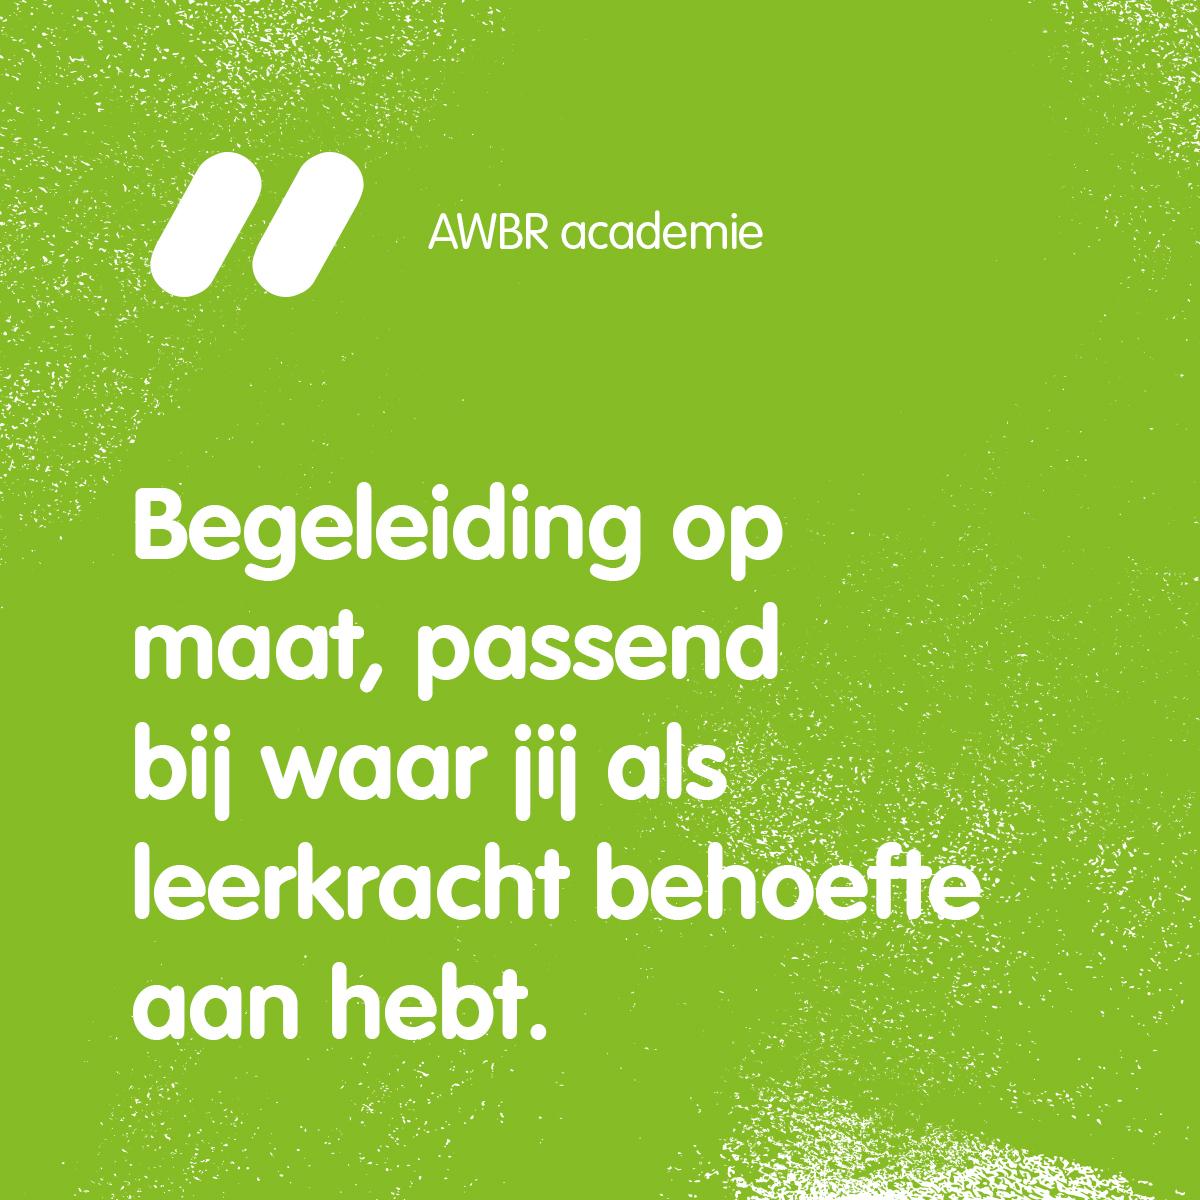 Quote AWBR academie